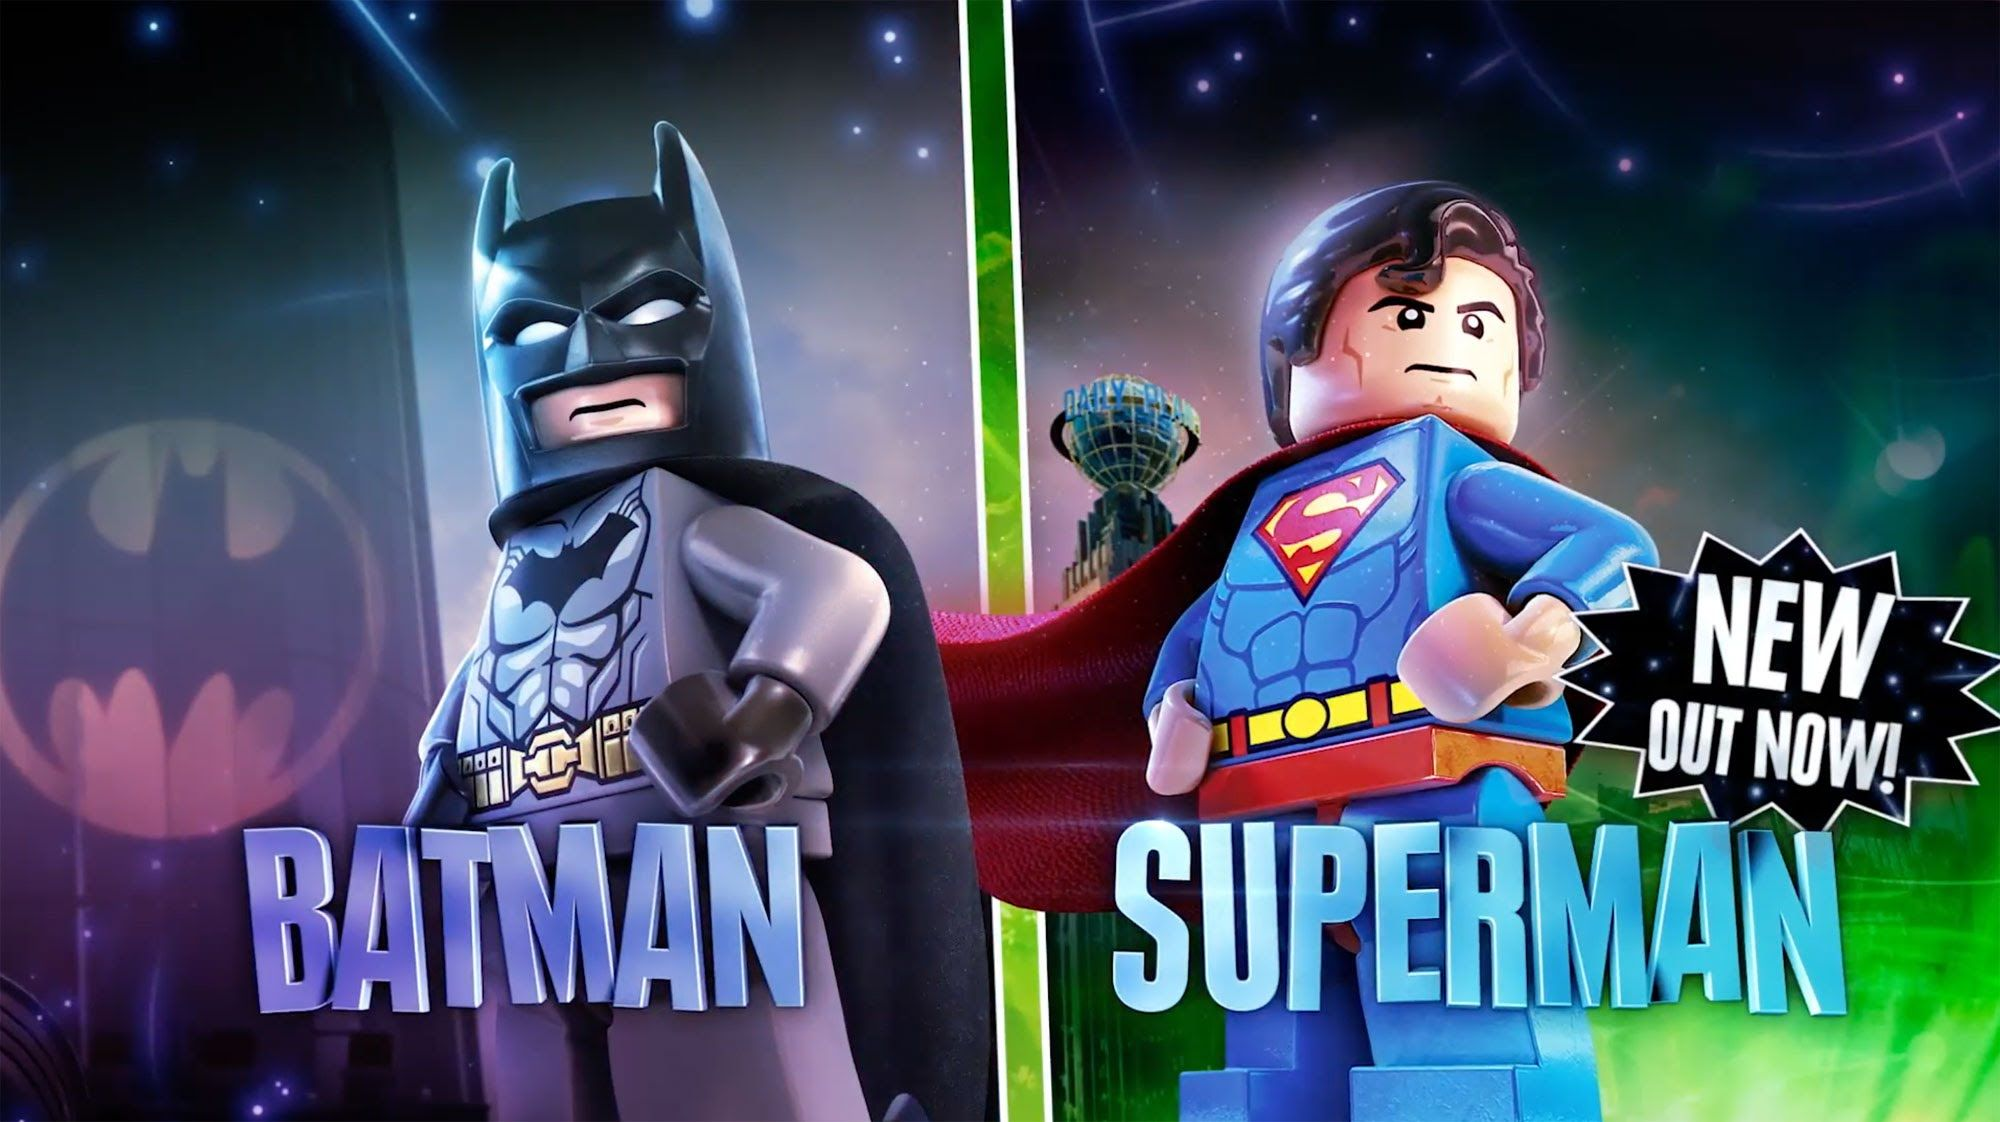 Lego Dimensions Batman V Superman Trailer Hd Ps4 Ps3 Video Game Lego Dimensions Batman Batman V